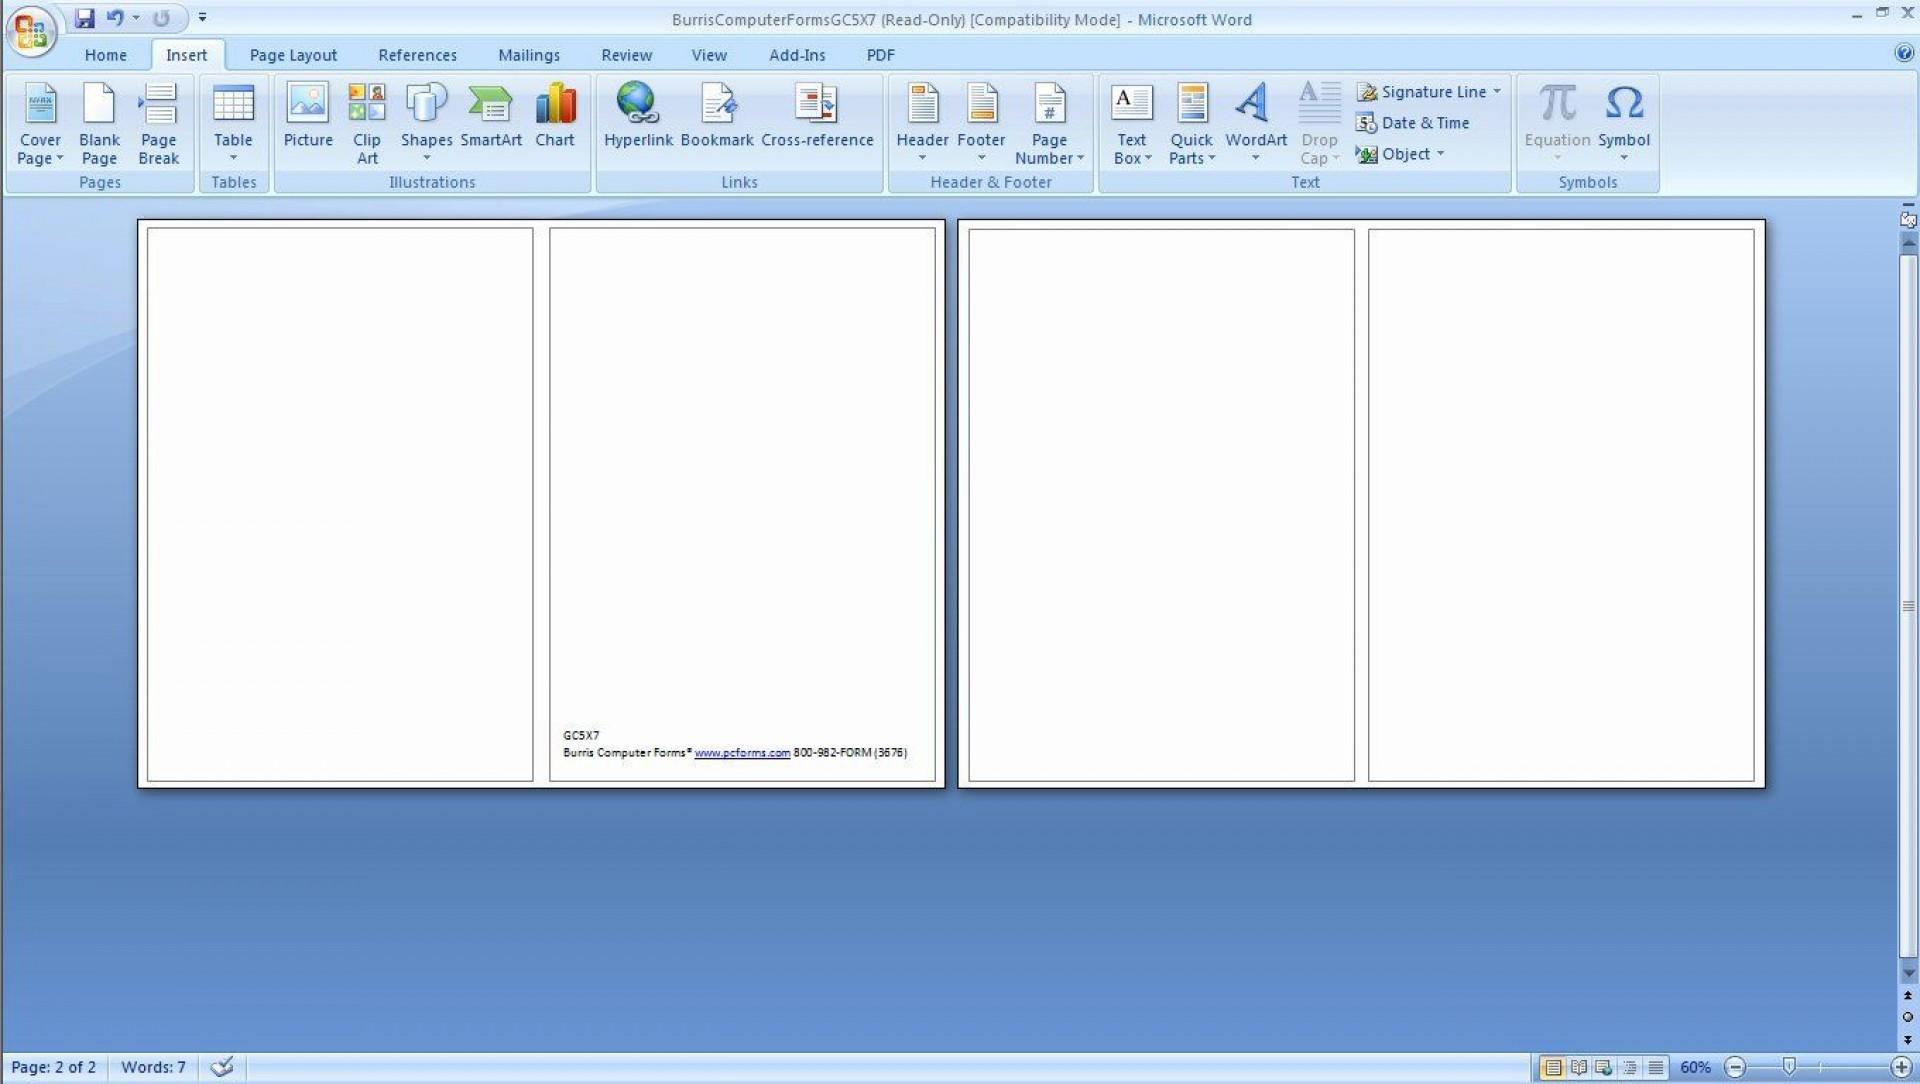 003 Wonderful Microsoft Word Greeting Card Template Concept  Birthday Blank Free 20071920